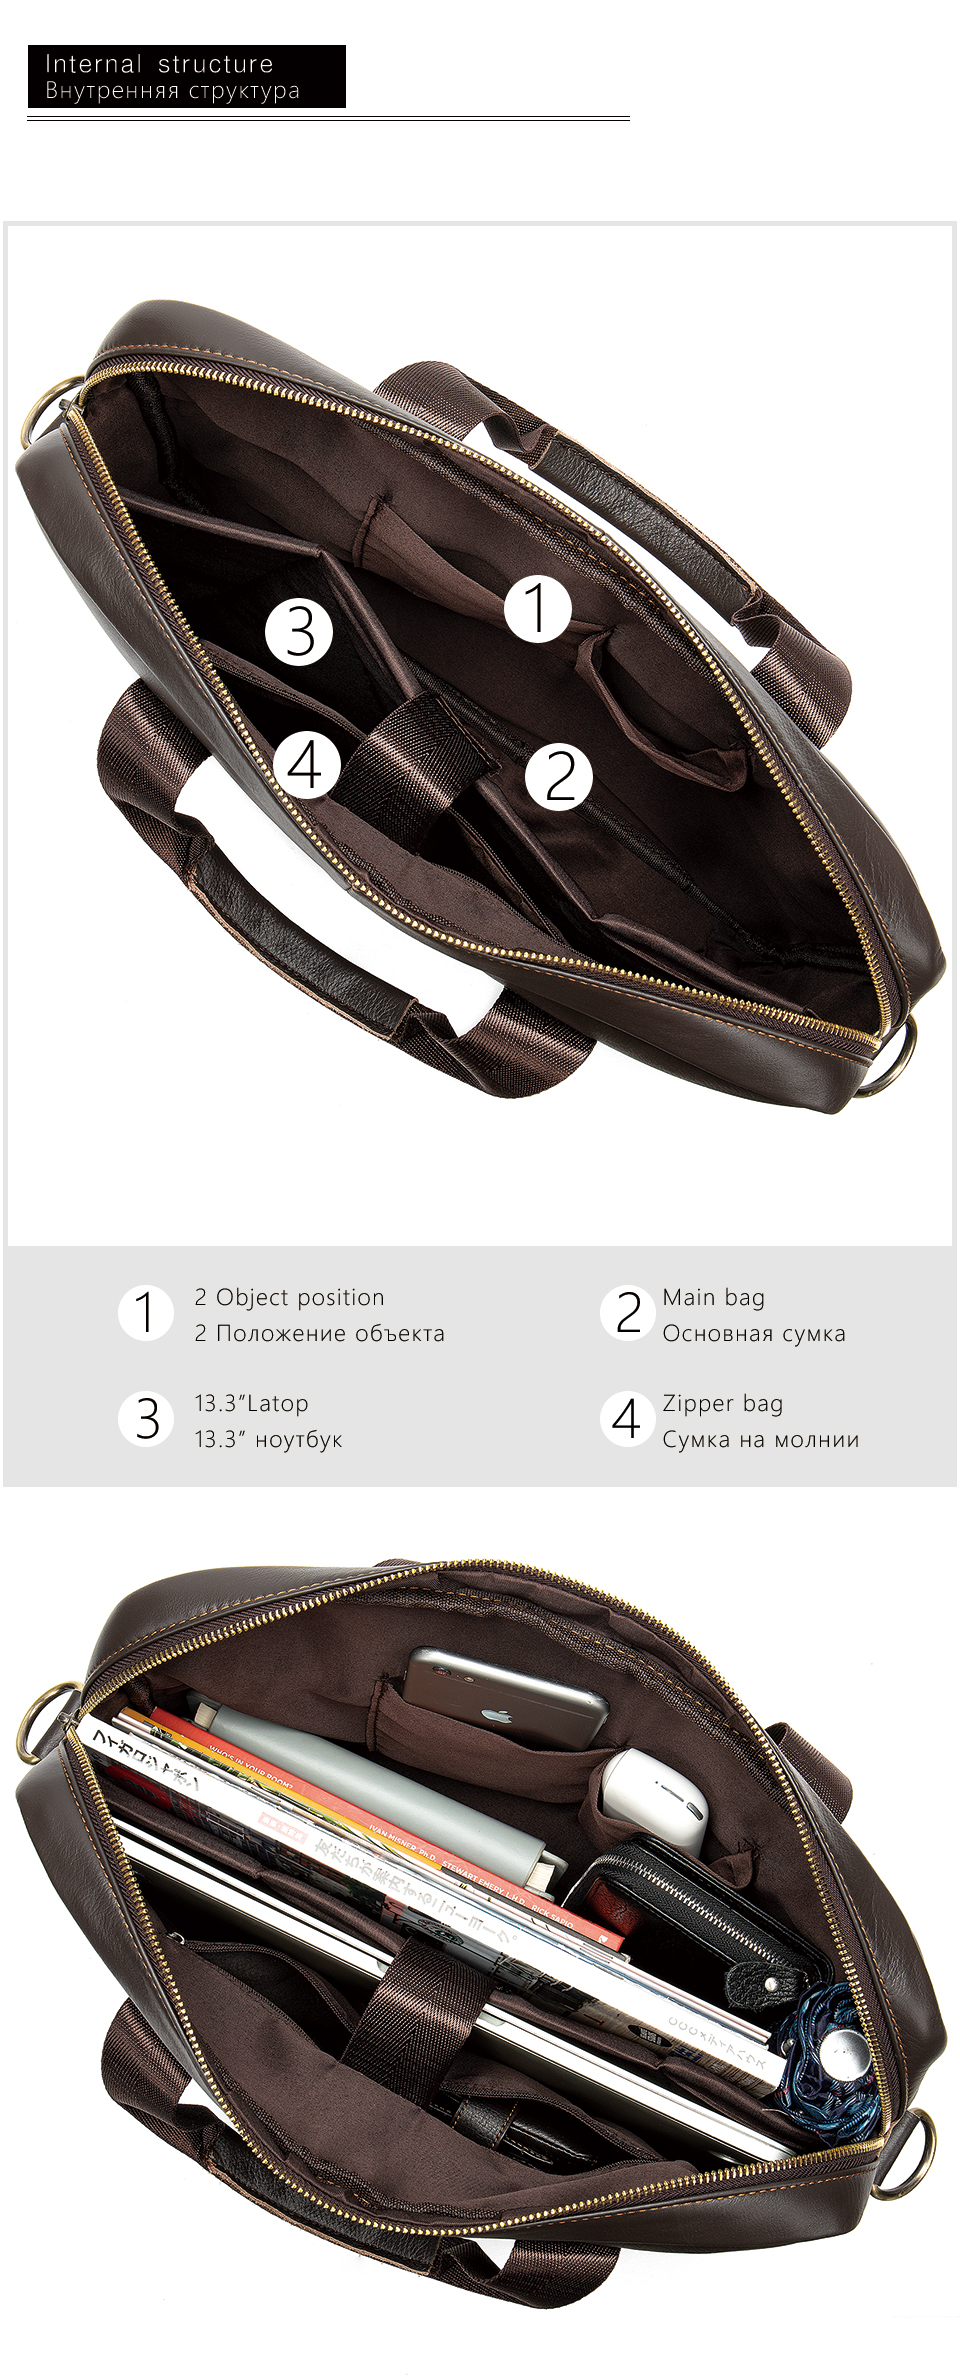 HTB1H JWVZfpK1RjSZFOq6y6nFXaw WESTAL Men's Briefcase Men's Bag Genuine Leather Laptop Bag Leather Computer/Office Bags for Men Document Briefcases Totes Bags